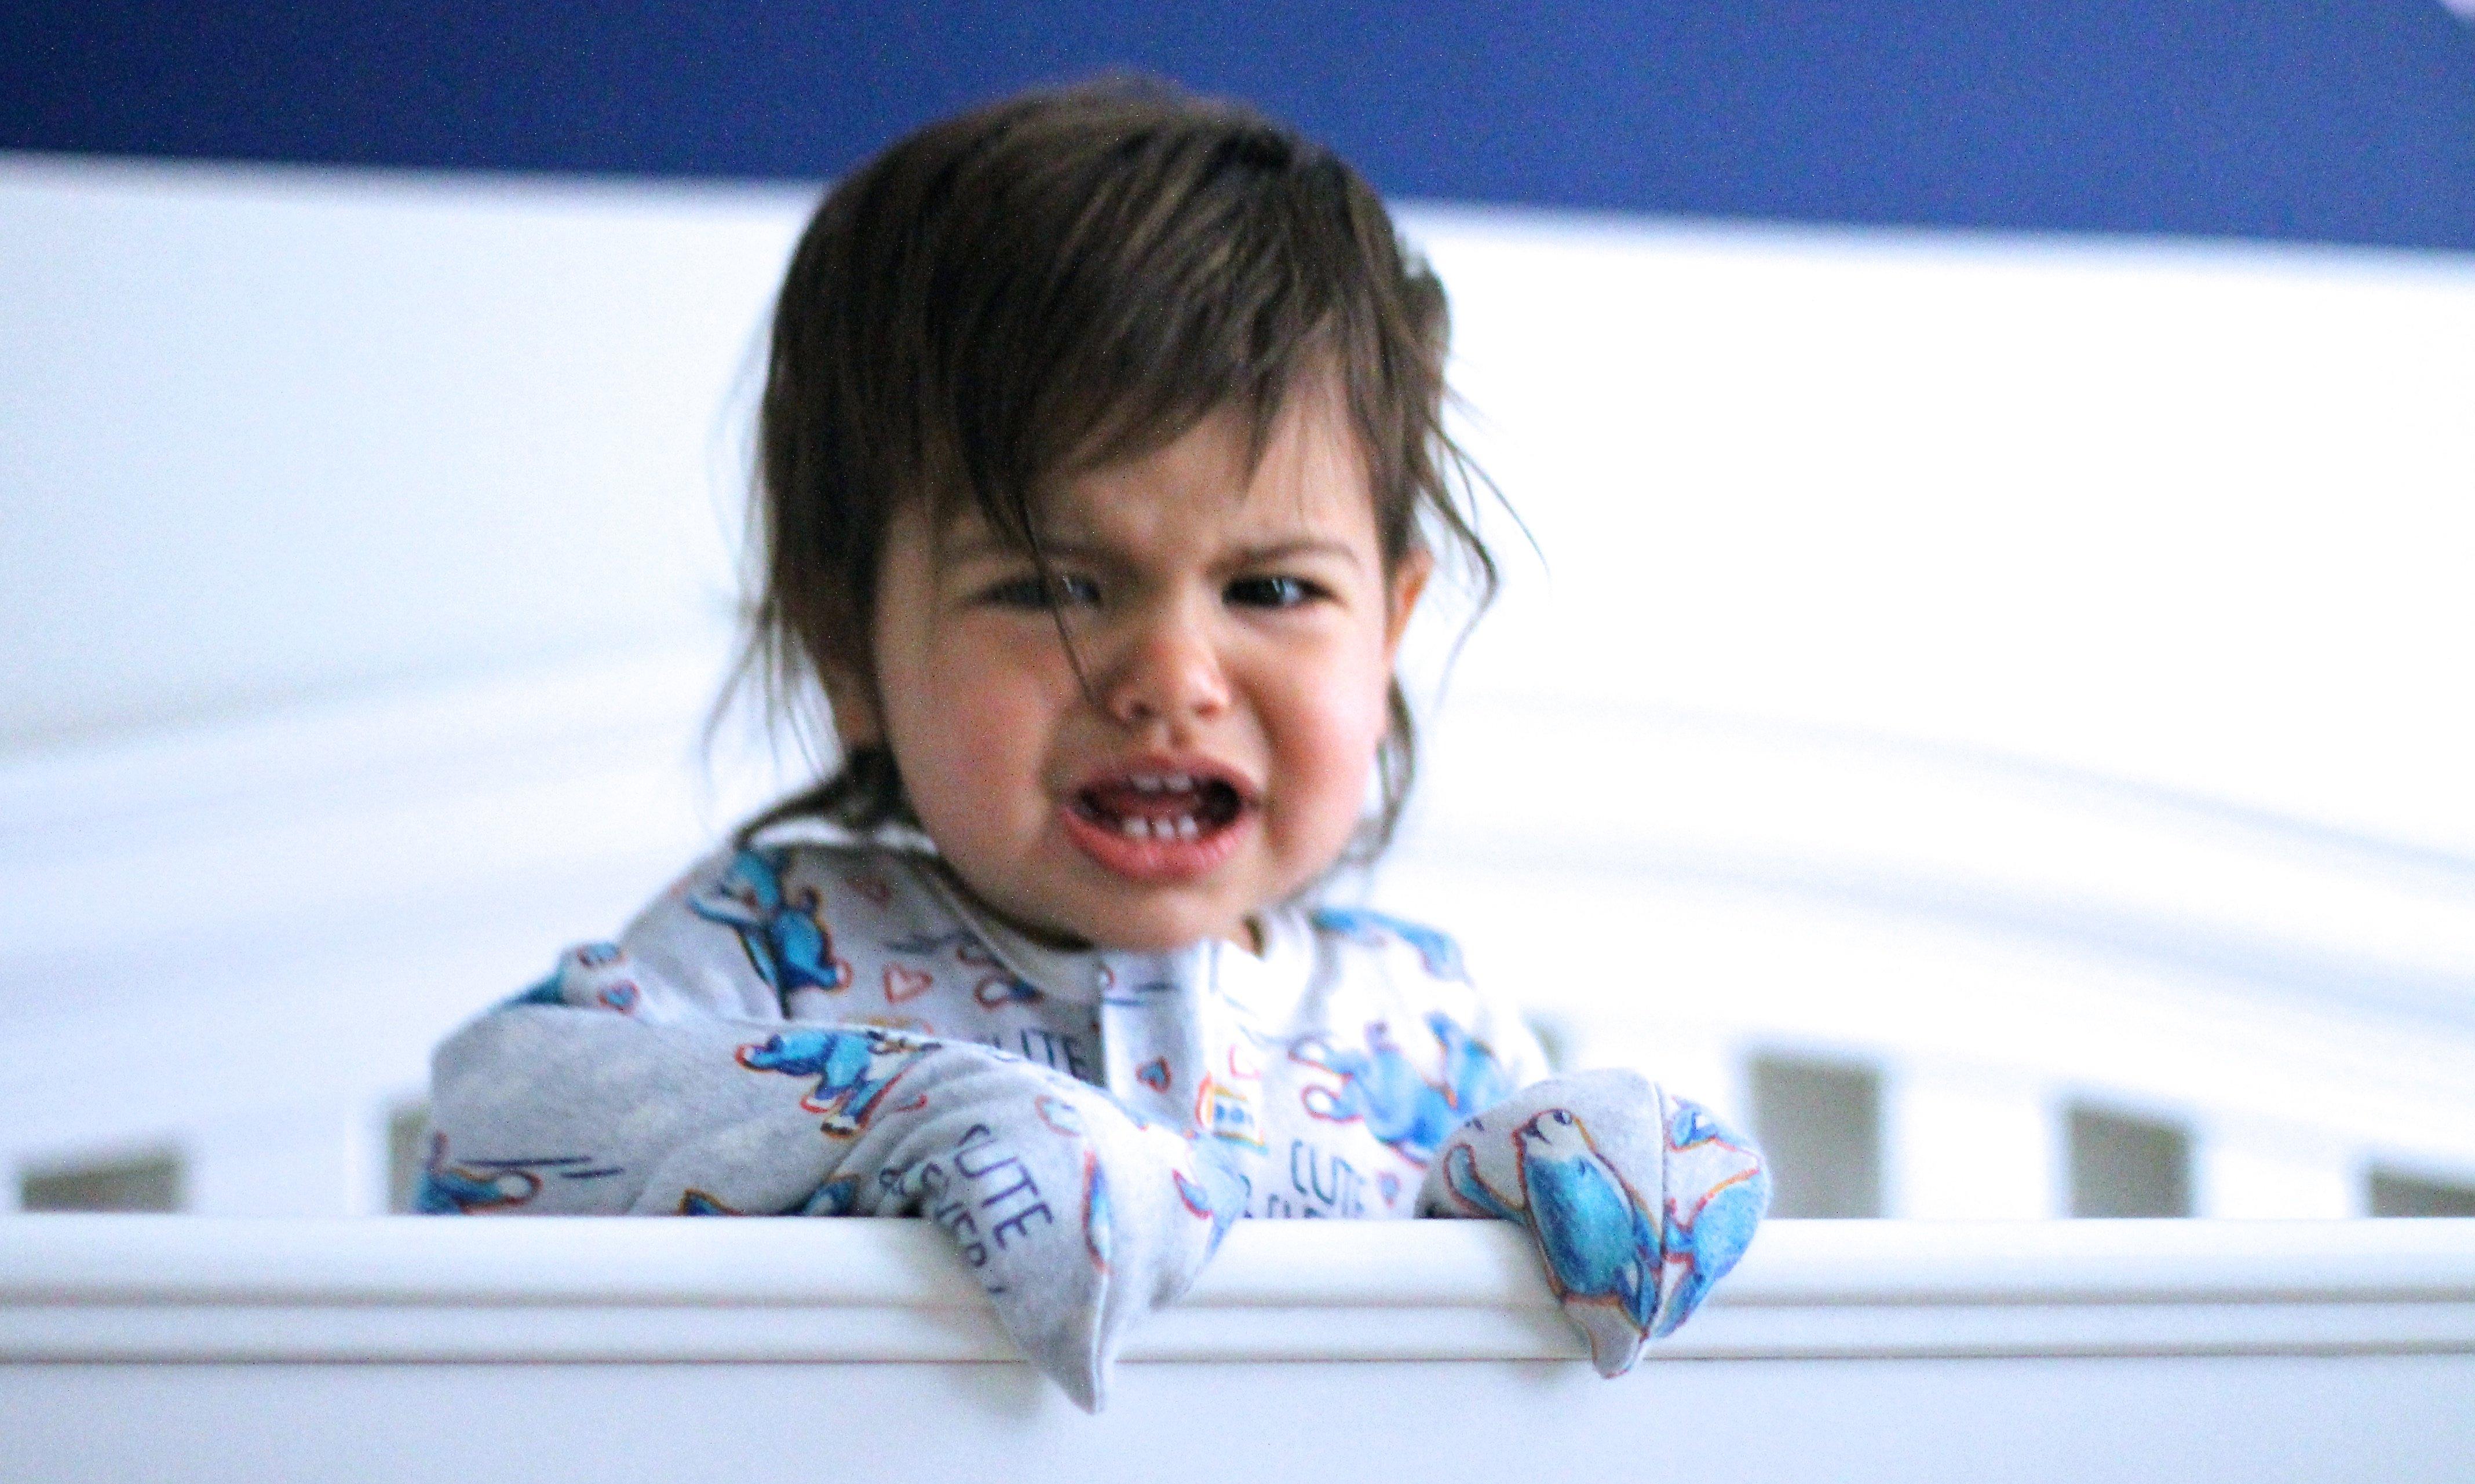 Child Sleep Training Myths